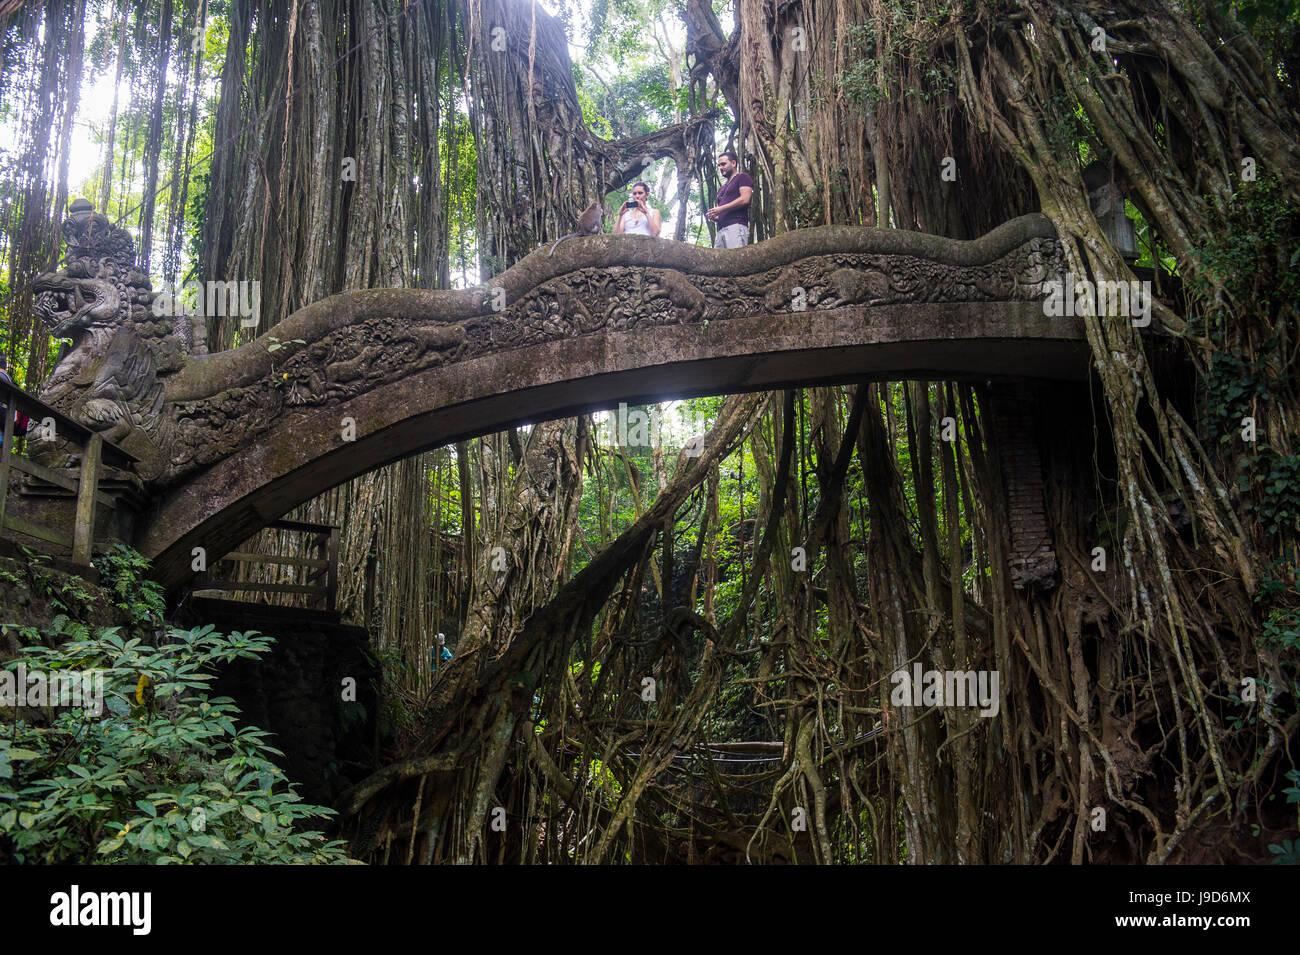 Very beautiful carved bridge with overgrowing trees, Sacred Monkey Forest Sanctuary, Ubud, Bali, Indonesia, Southeast - Stock Image